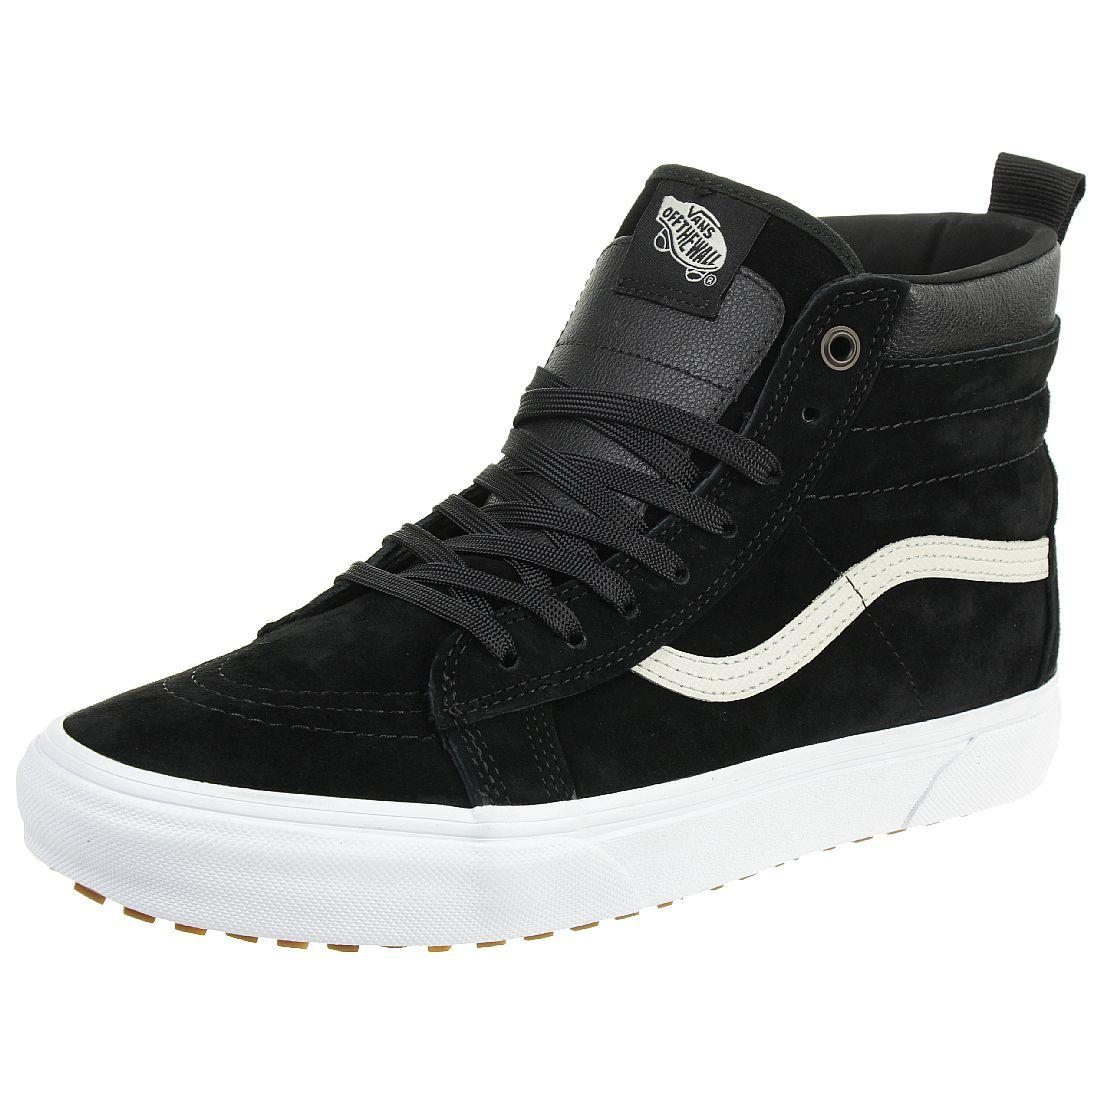 VANS Classic SK8 HI MTE Winter Sneaker Schuhe Leder